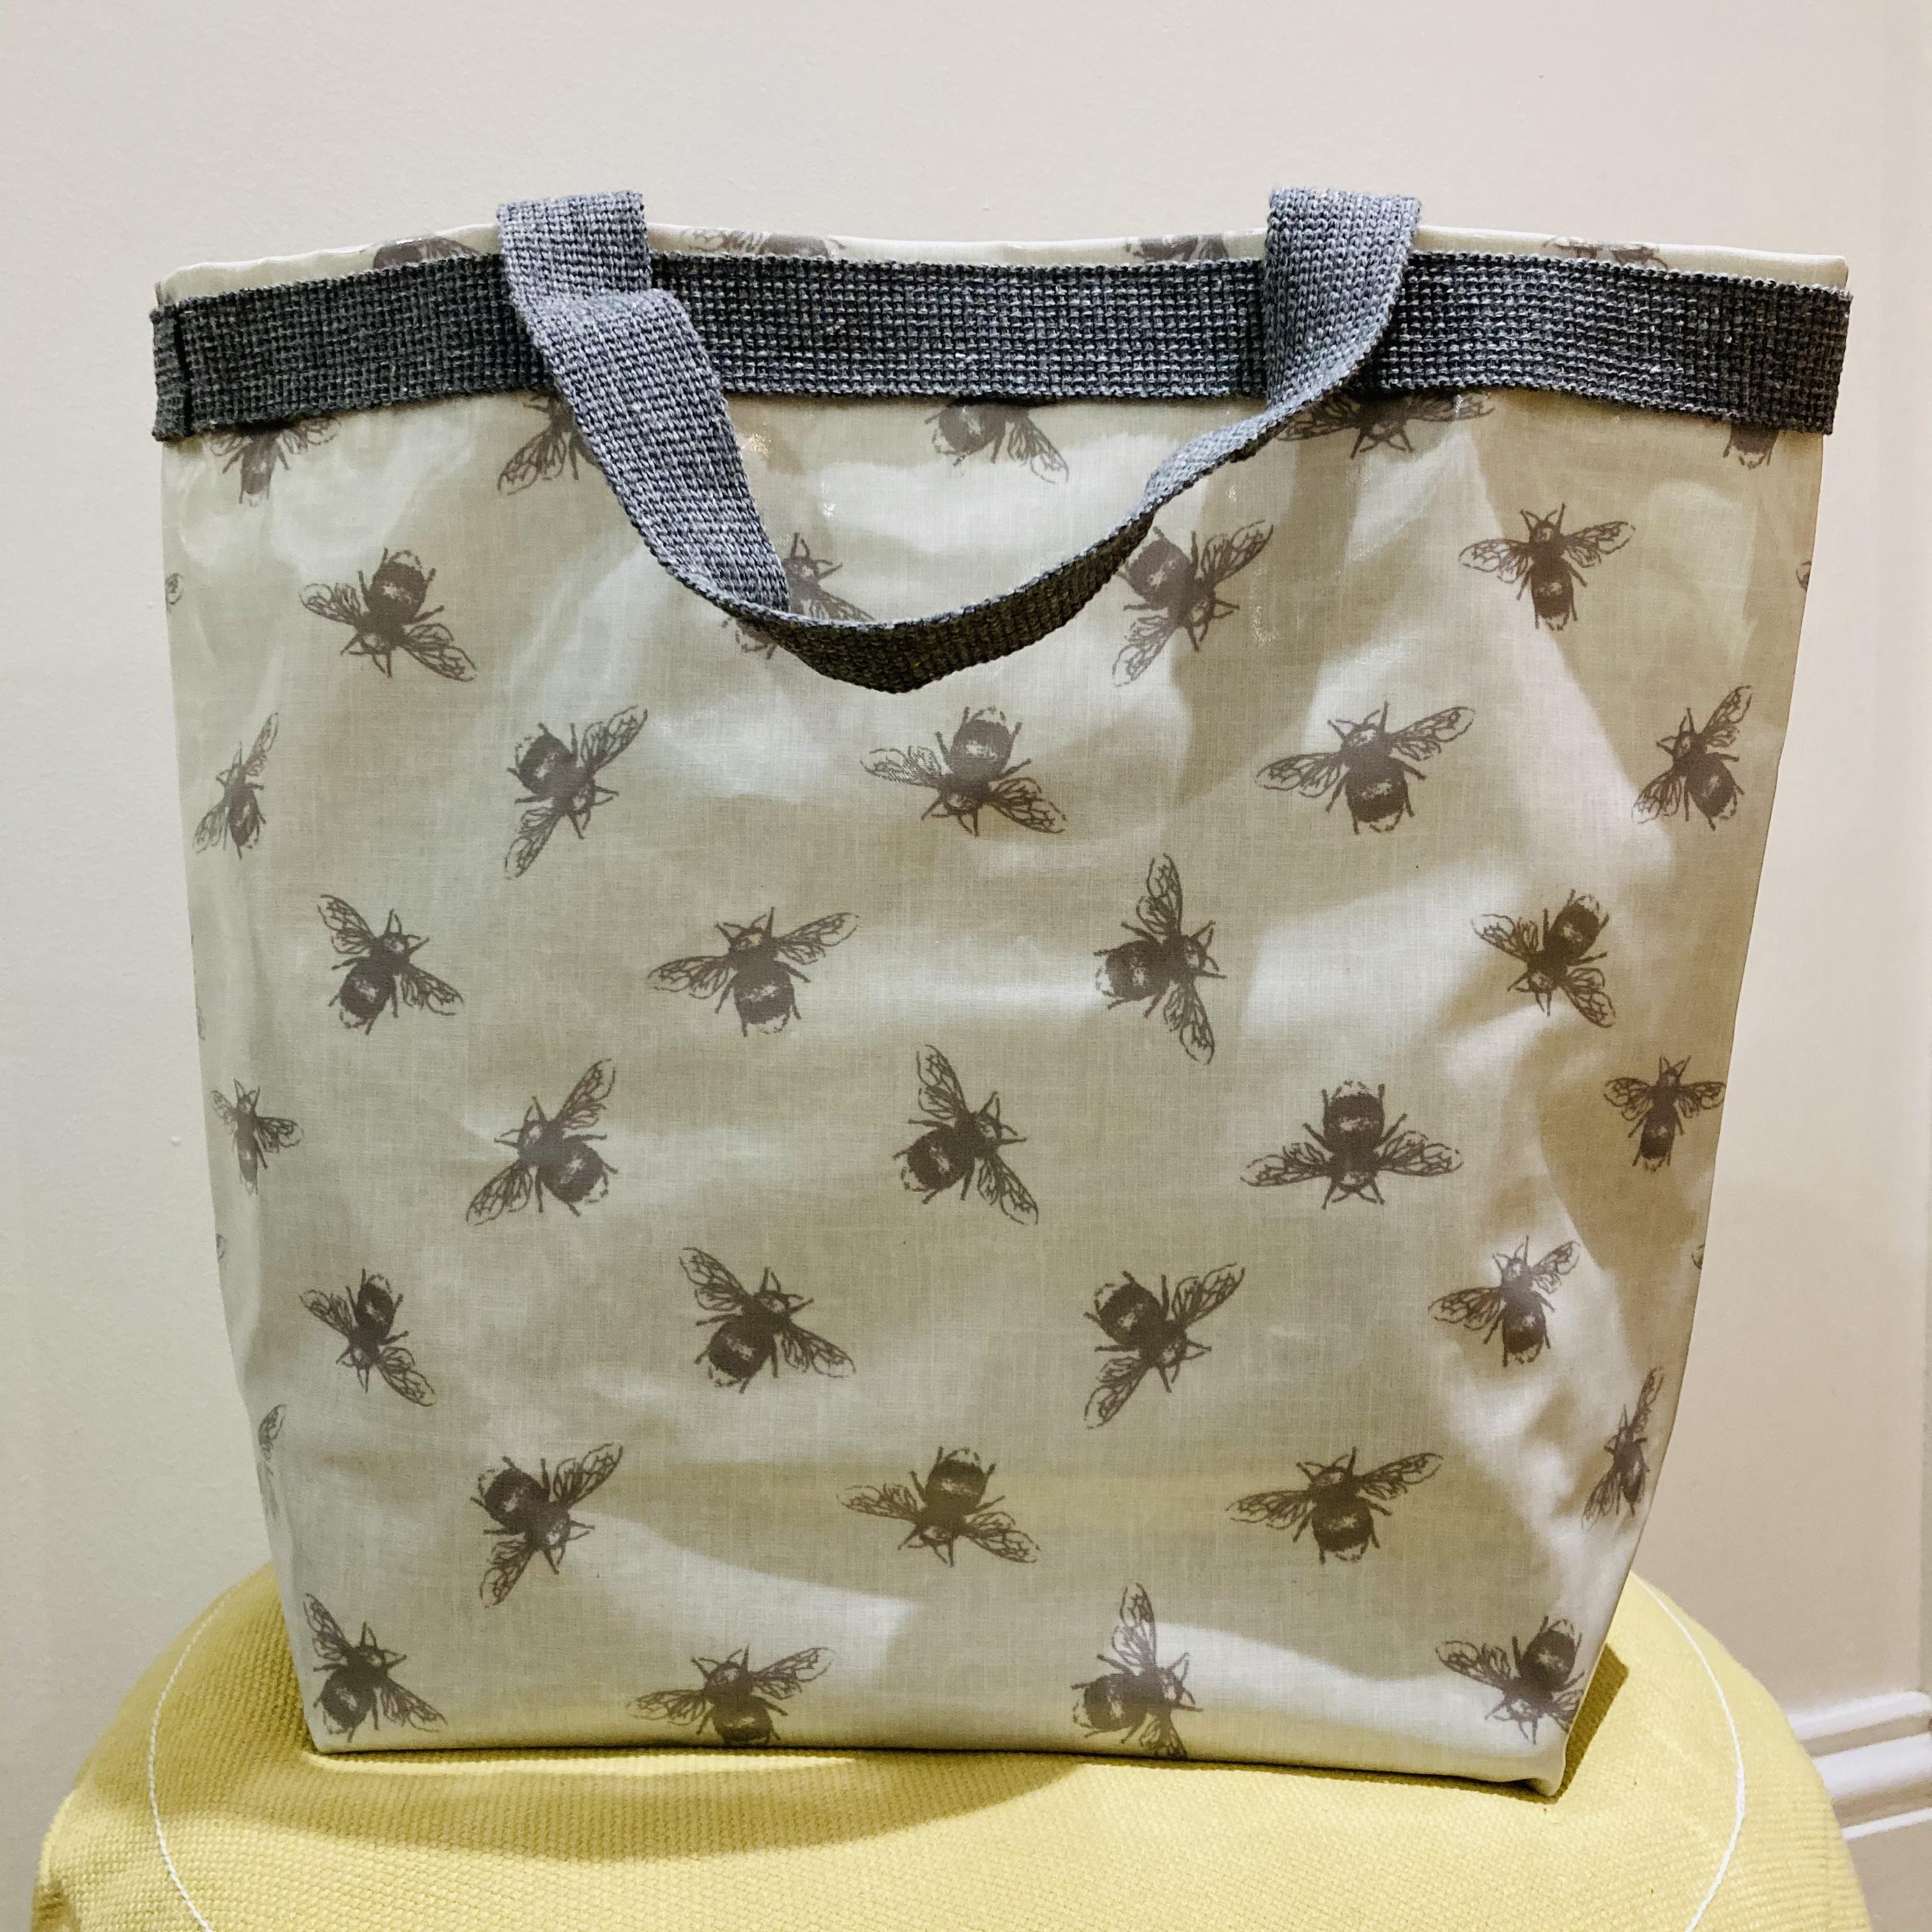 Bee print vinyl tote bag by Stella's Stitchcraft